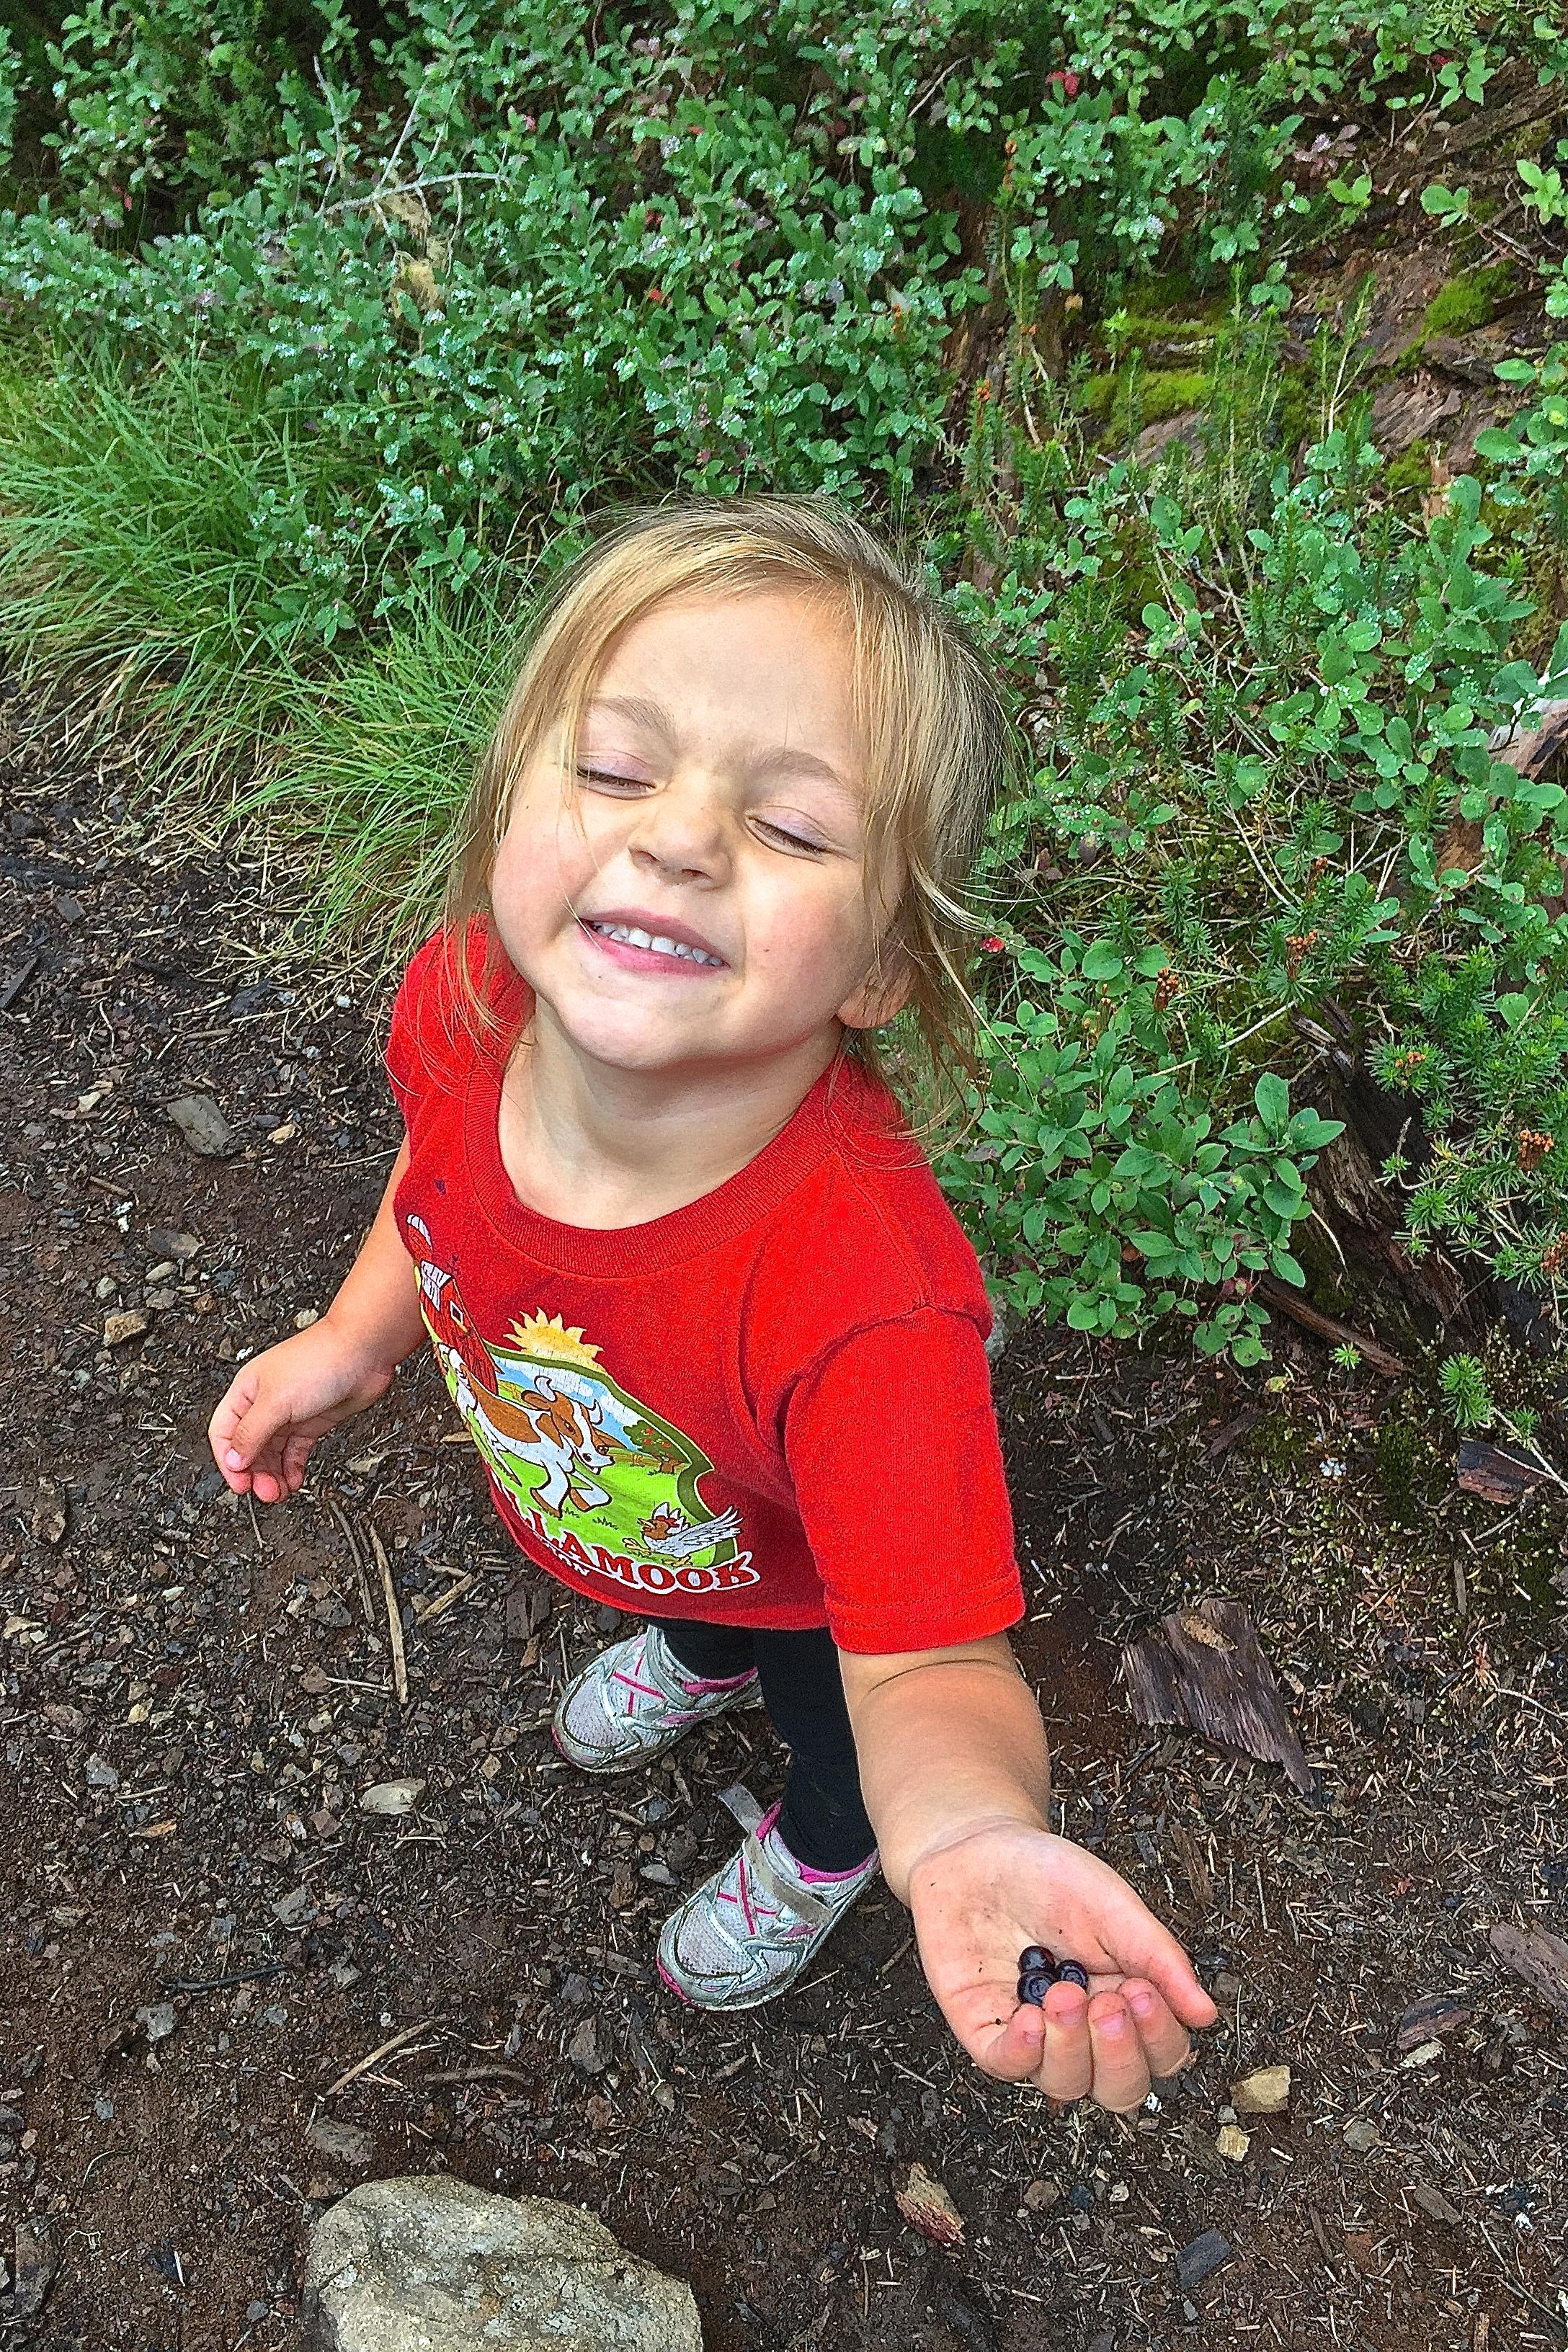 Reggie eating berries on the trail!!